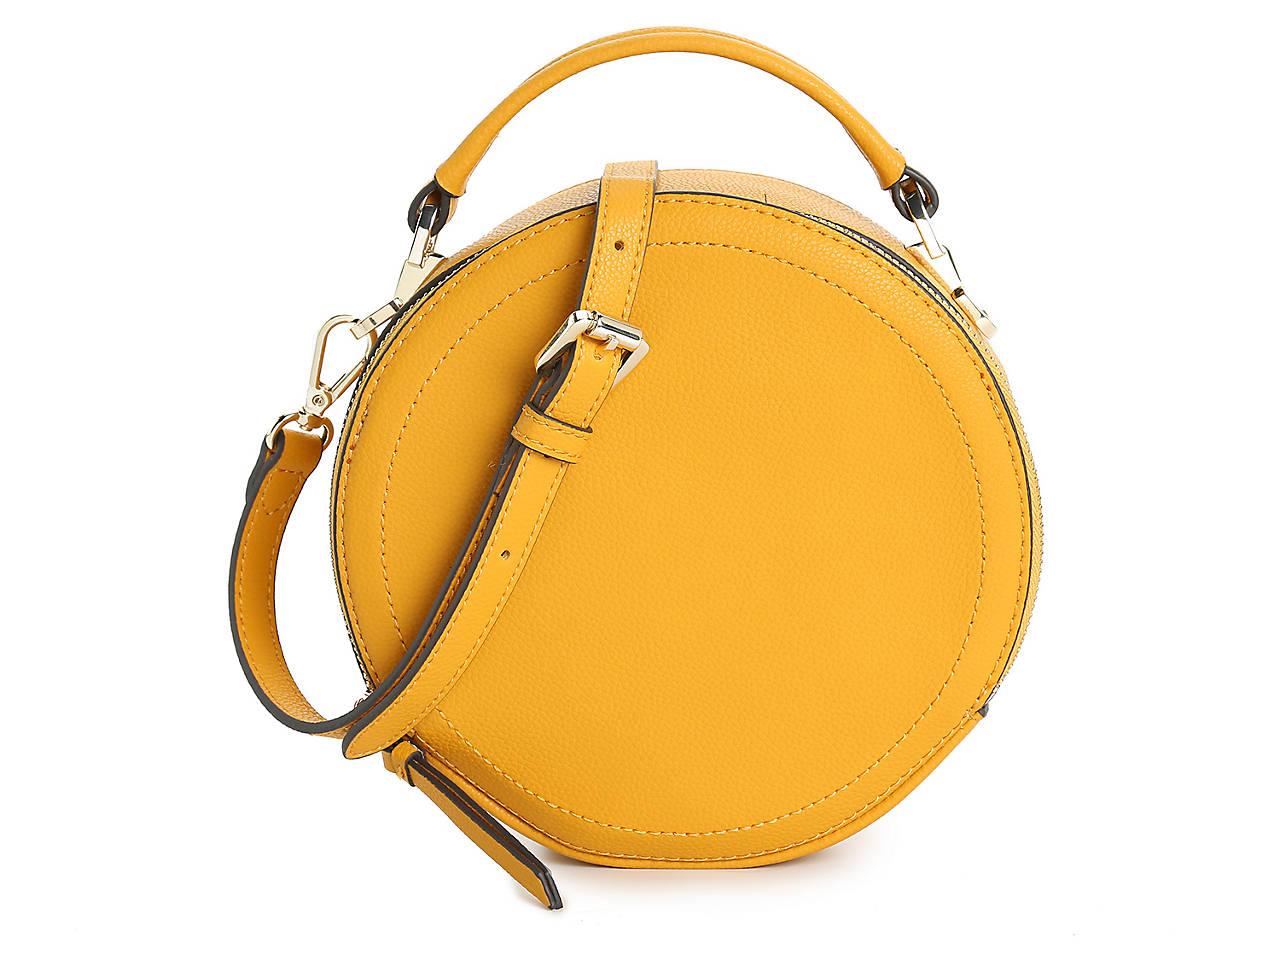 5c7a6000d Vince Camuto Chica Leather Crossbody Bag Women's Handbags ...